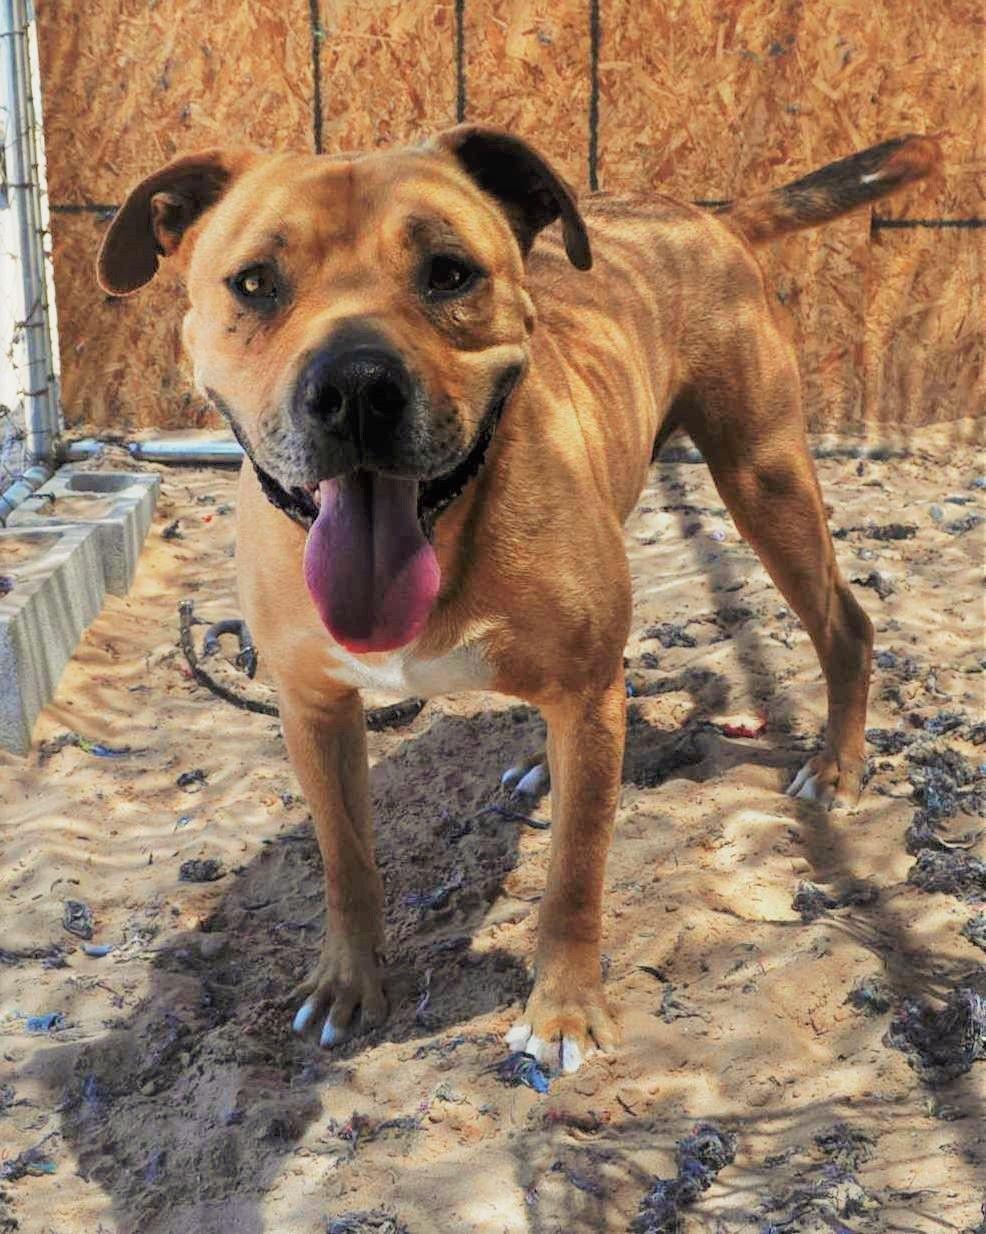 Bullboxer Pit dog for Adoption in Tempe, AZ. ADN565019 on